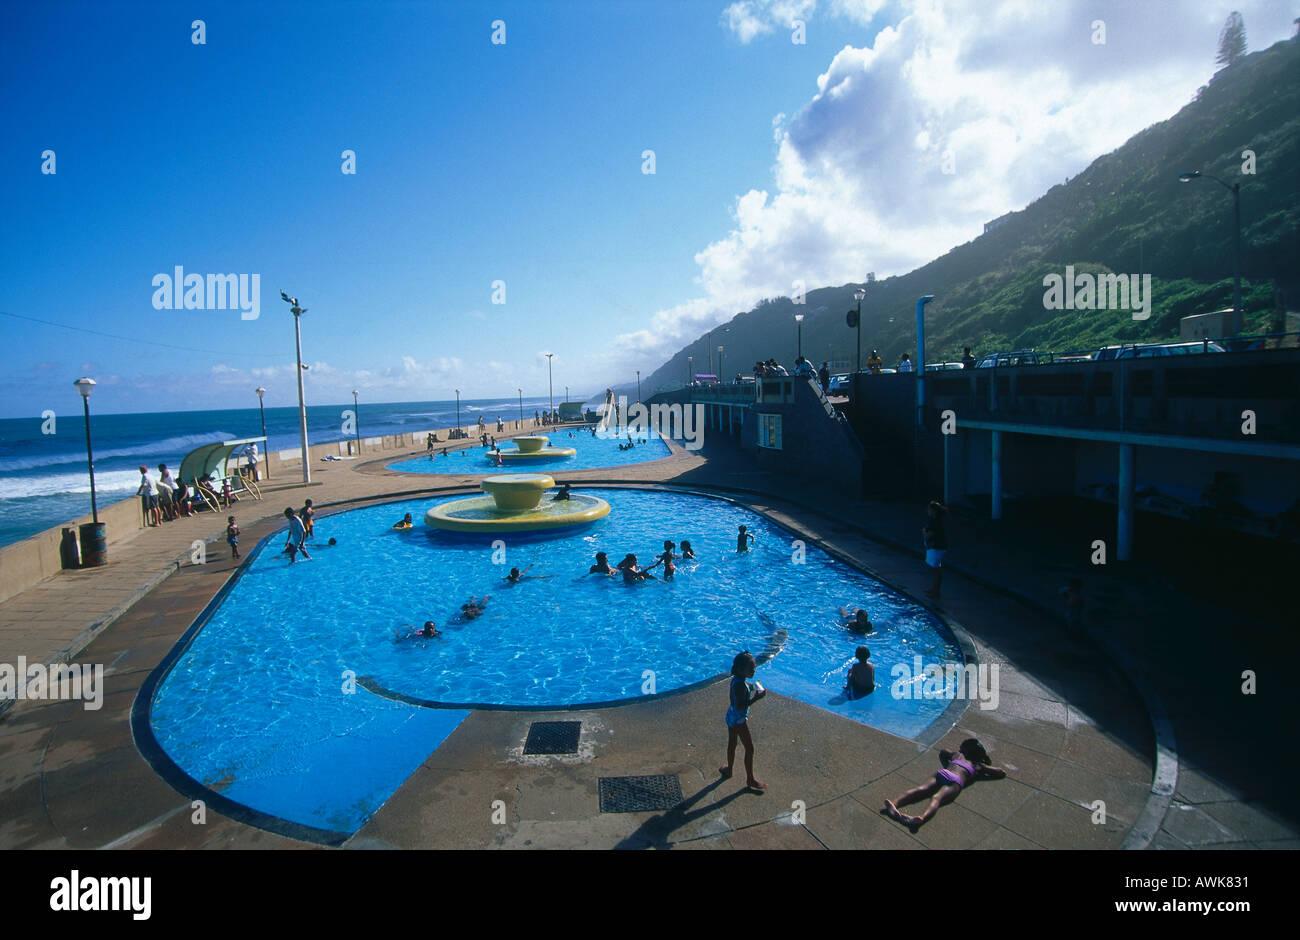 Durban beach swimming stock photos durban beach swimming stock images alamy for Hotels with swimming pools in brighton